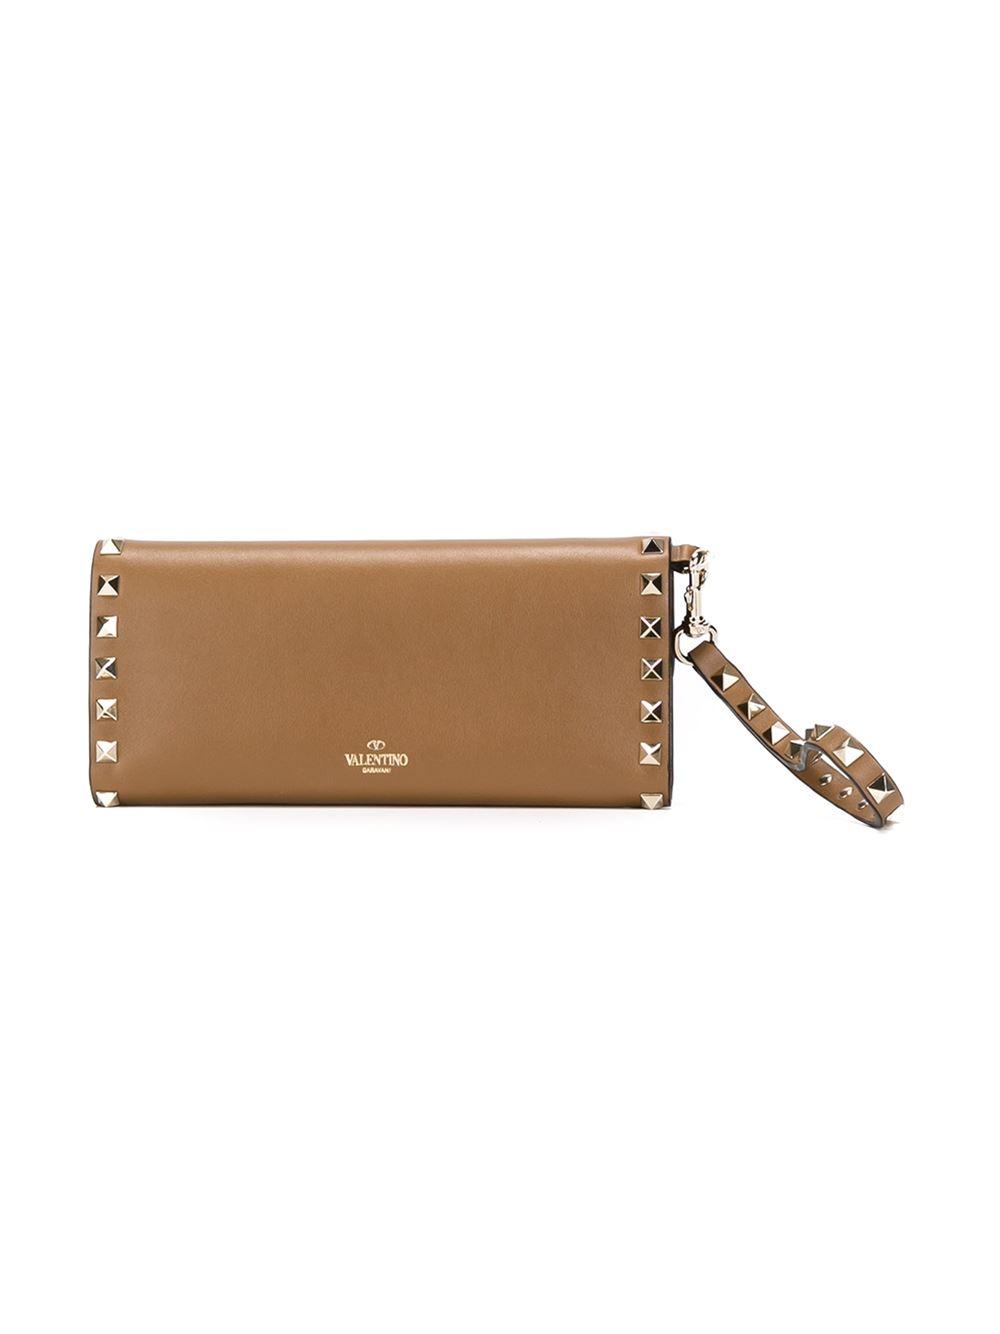 Valentino 'rockstud' Wallet in Brown | Lyst